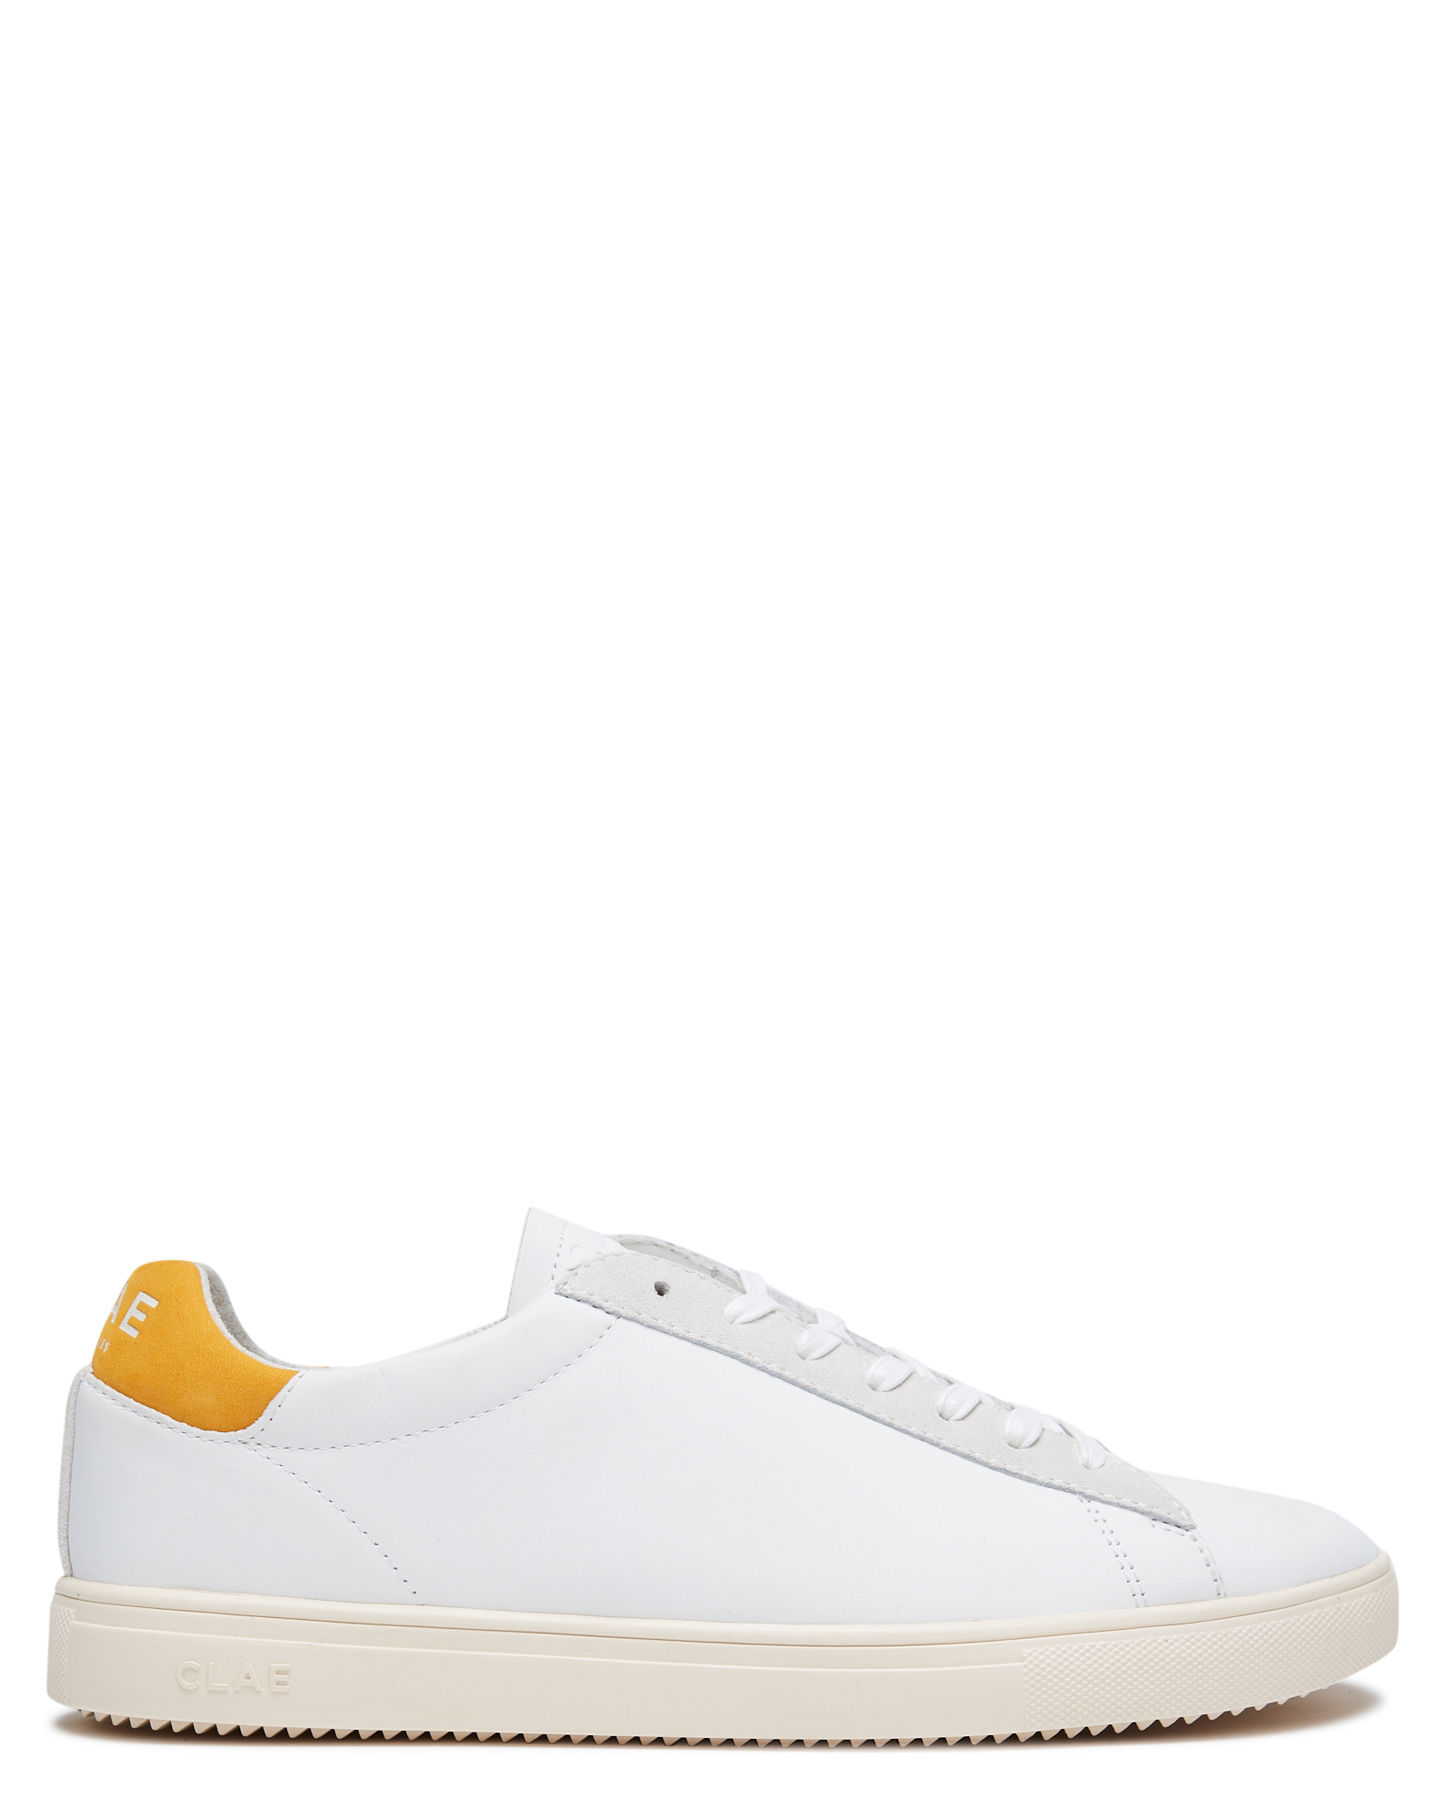 Clae Bradley California Mens Shoe White Golden Glow